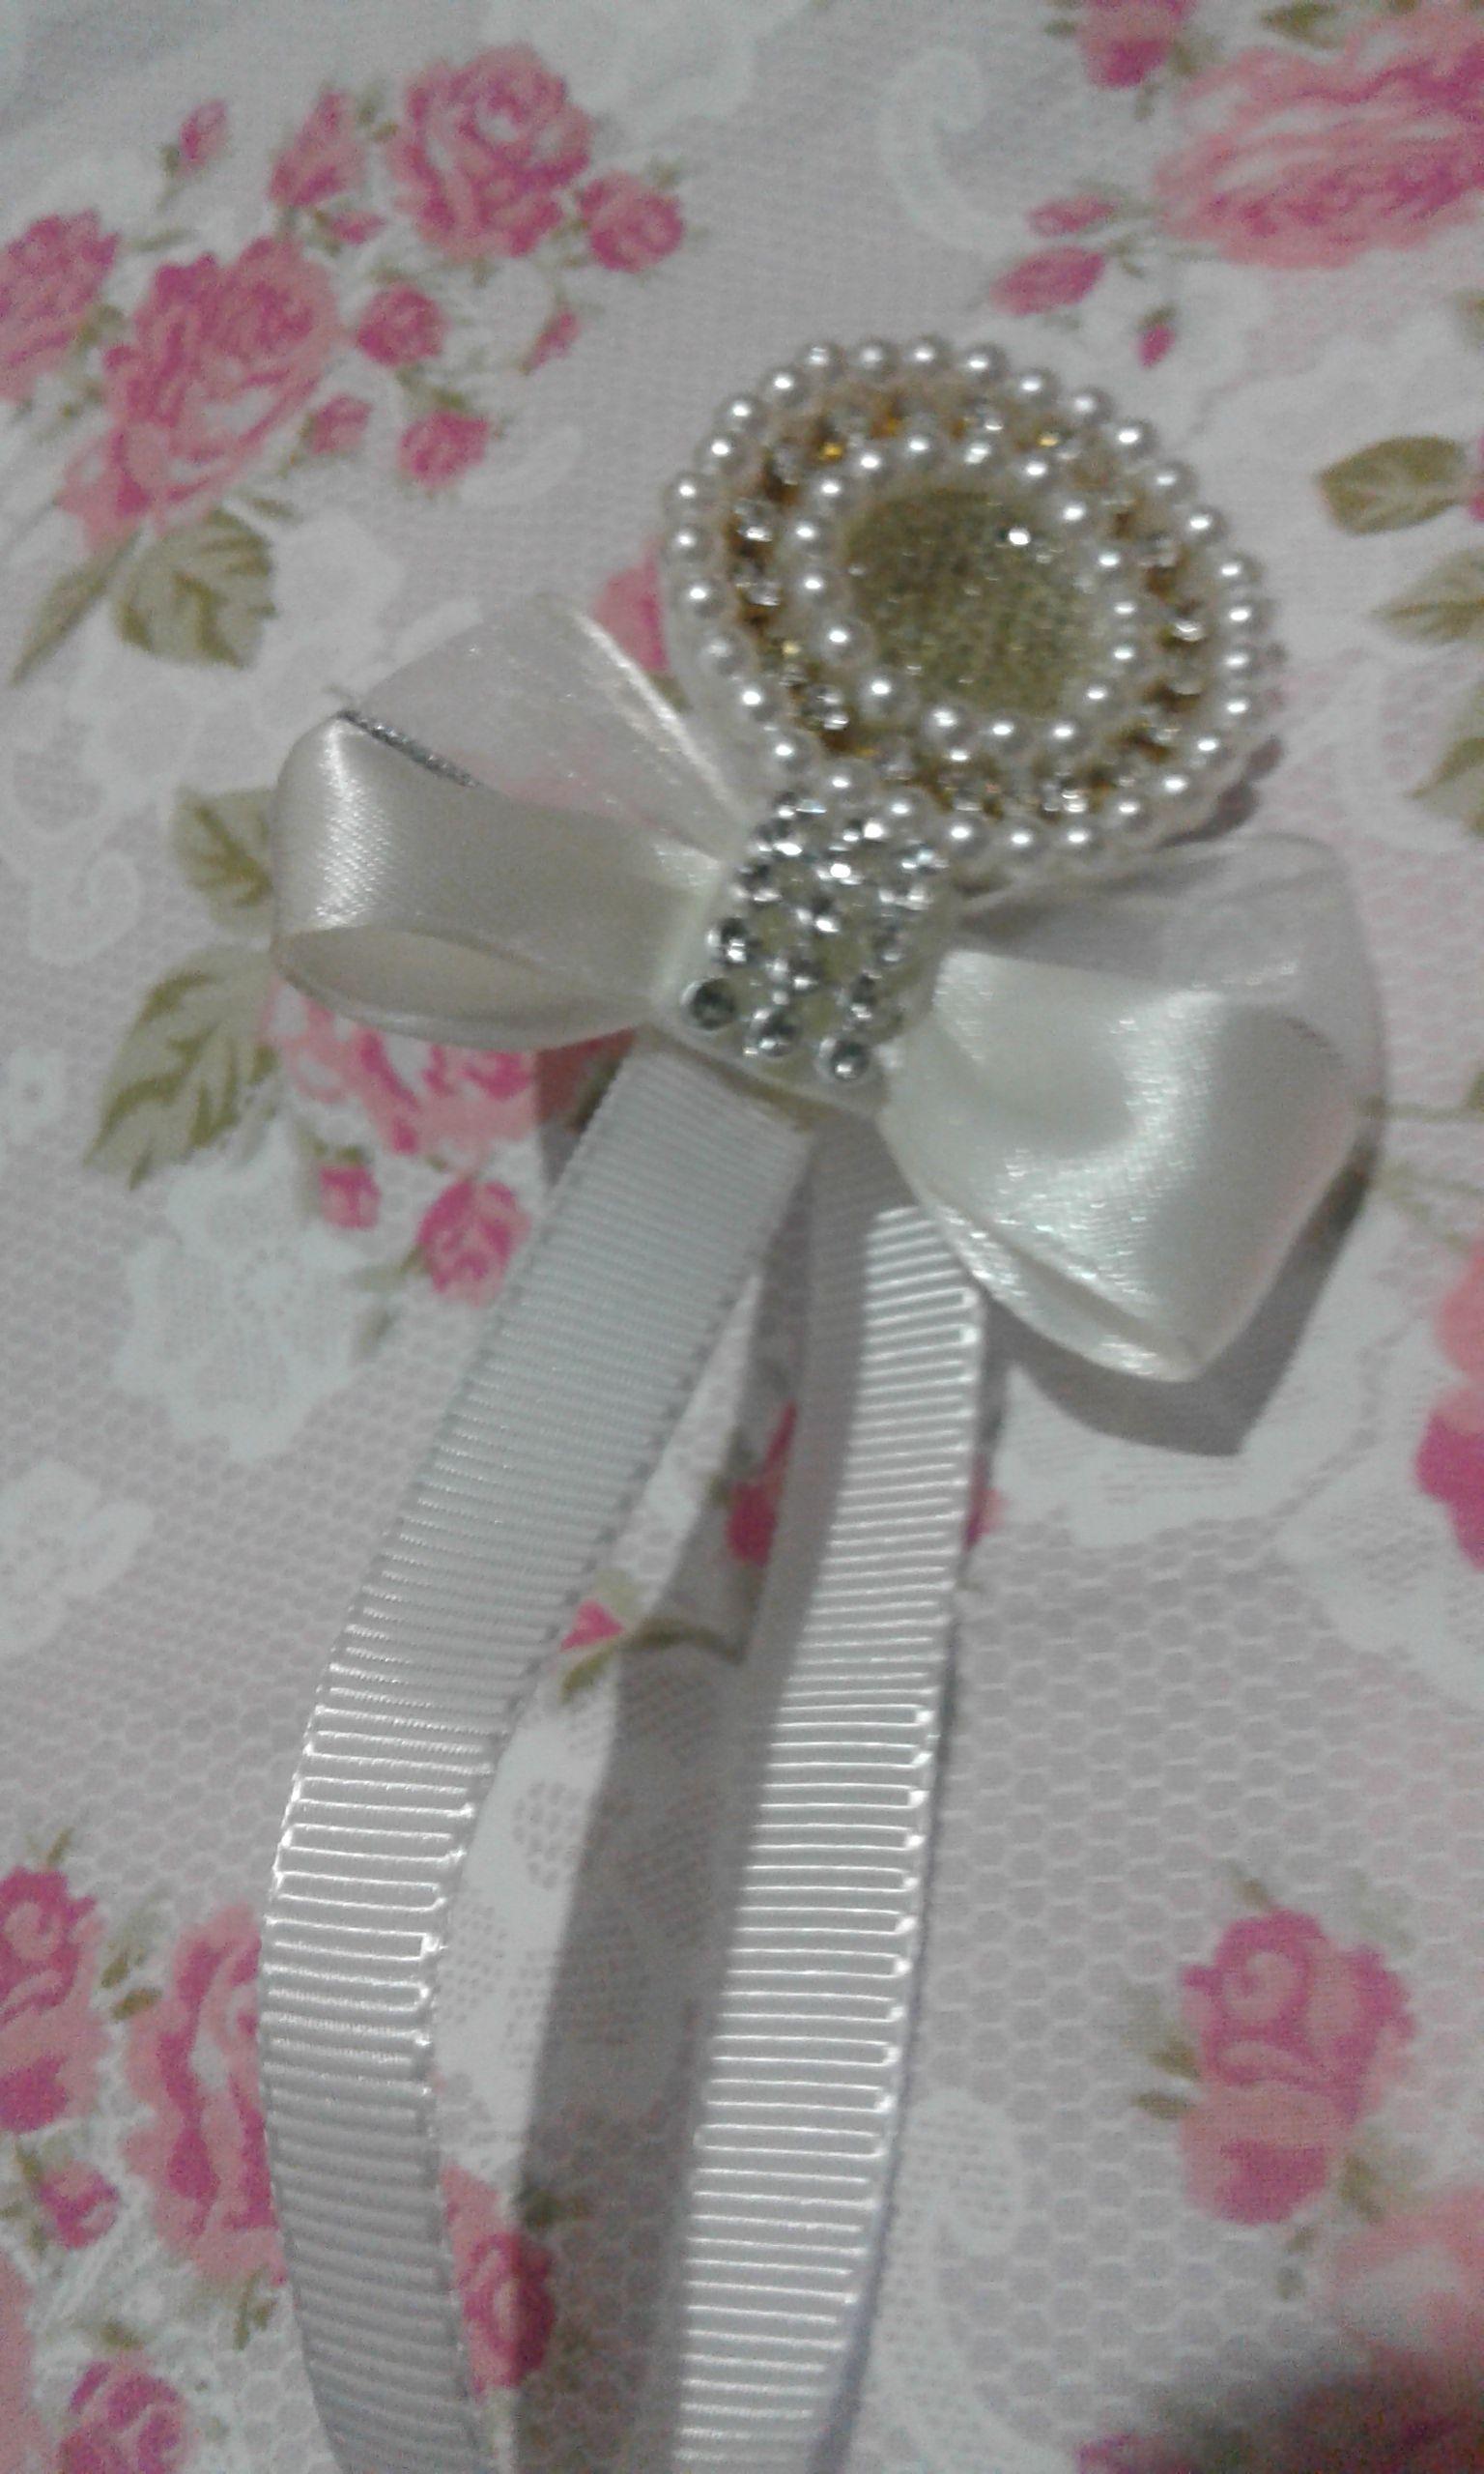 kit tiara e prendedor de chupeta de luxo feito de perola com strass e fita de cetim com organza